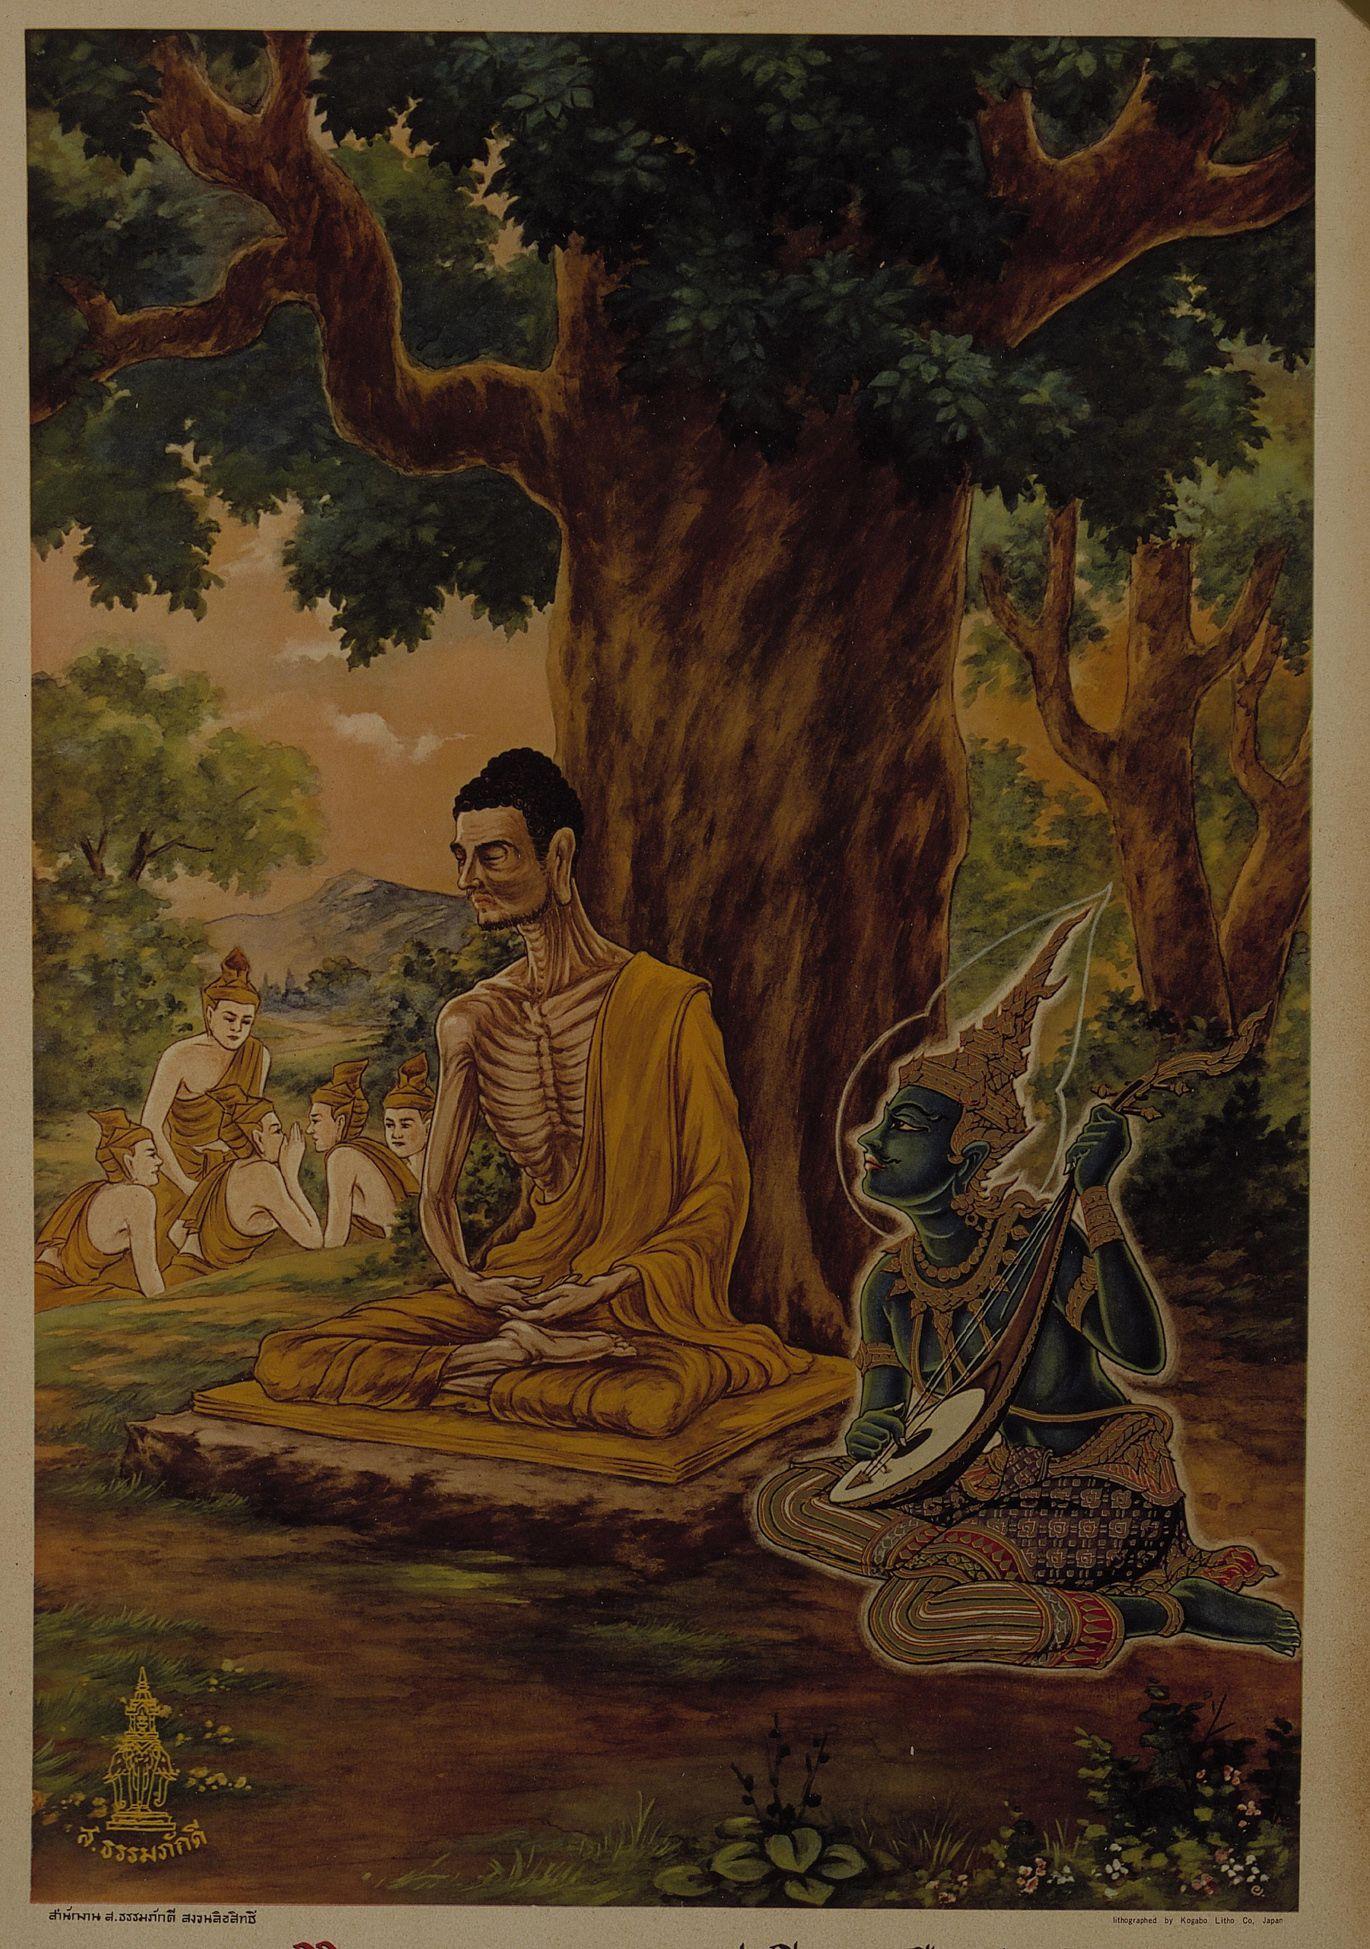 The Life of the Buddha (Thailand) : Sangha Life/ Monks & Nuns : Mingkok : Buddhistdoor